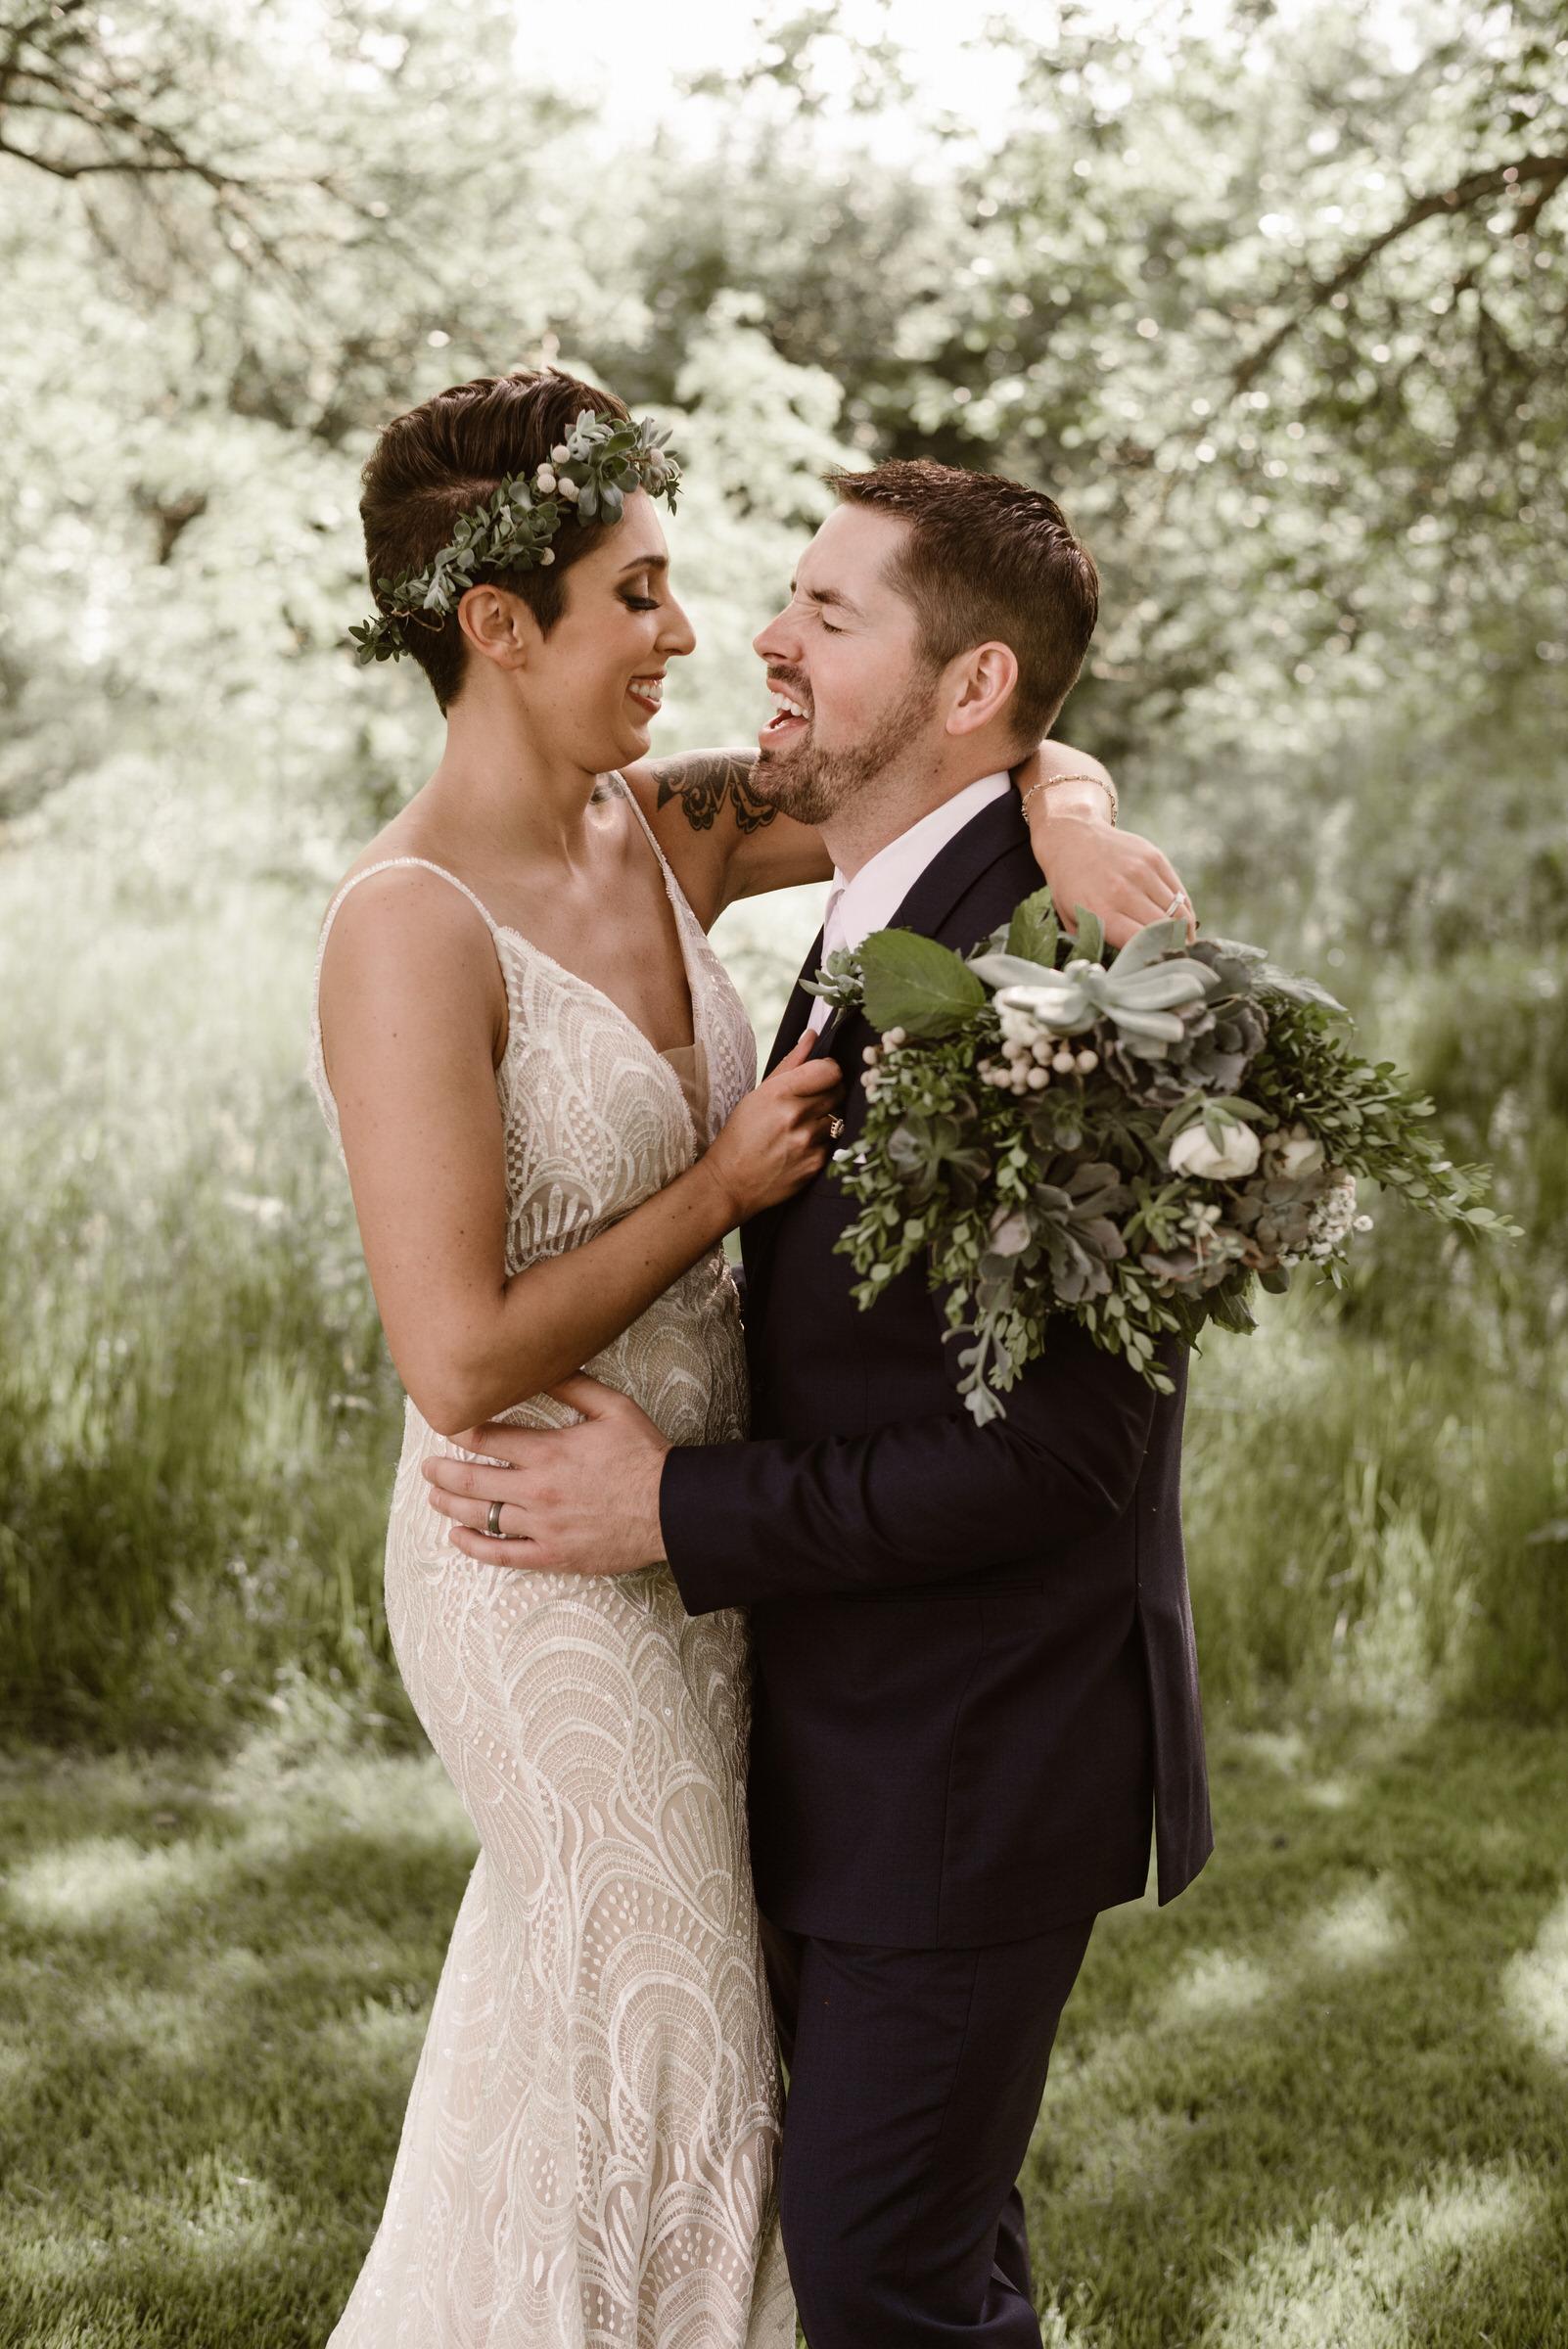 Wilderness-Ridge-Lincoln-Nebraska-Wedding-Kaylie-Sirek-Photography-073.jpg